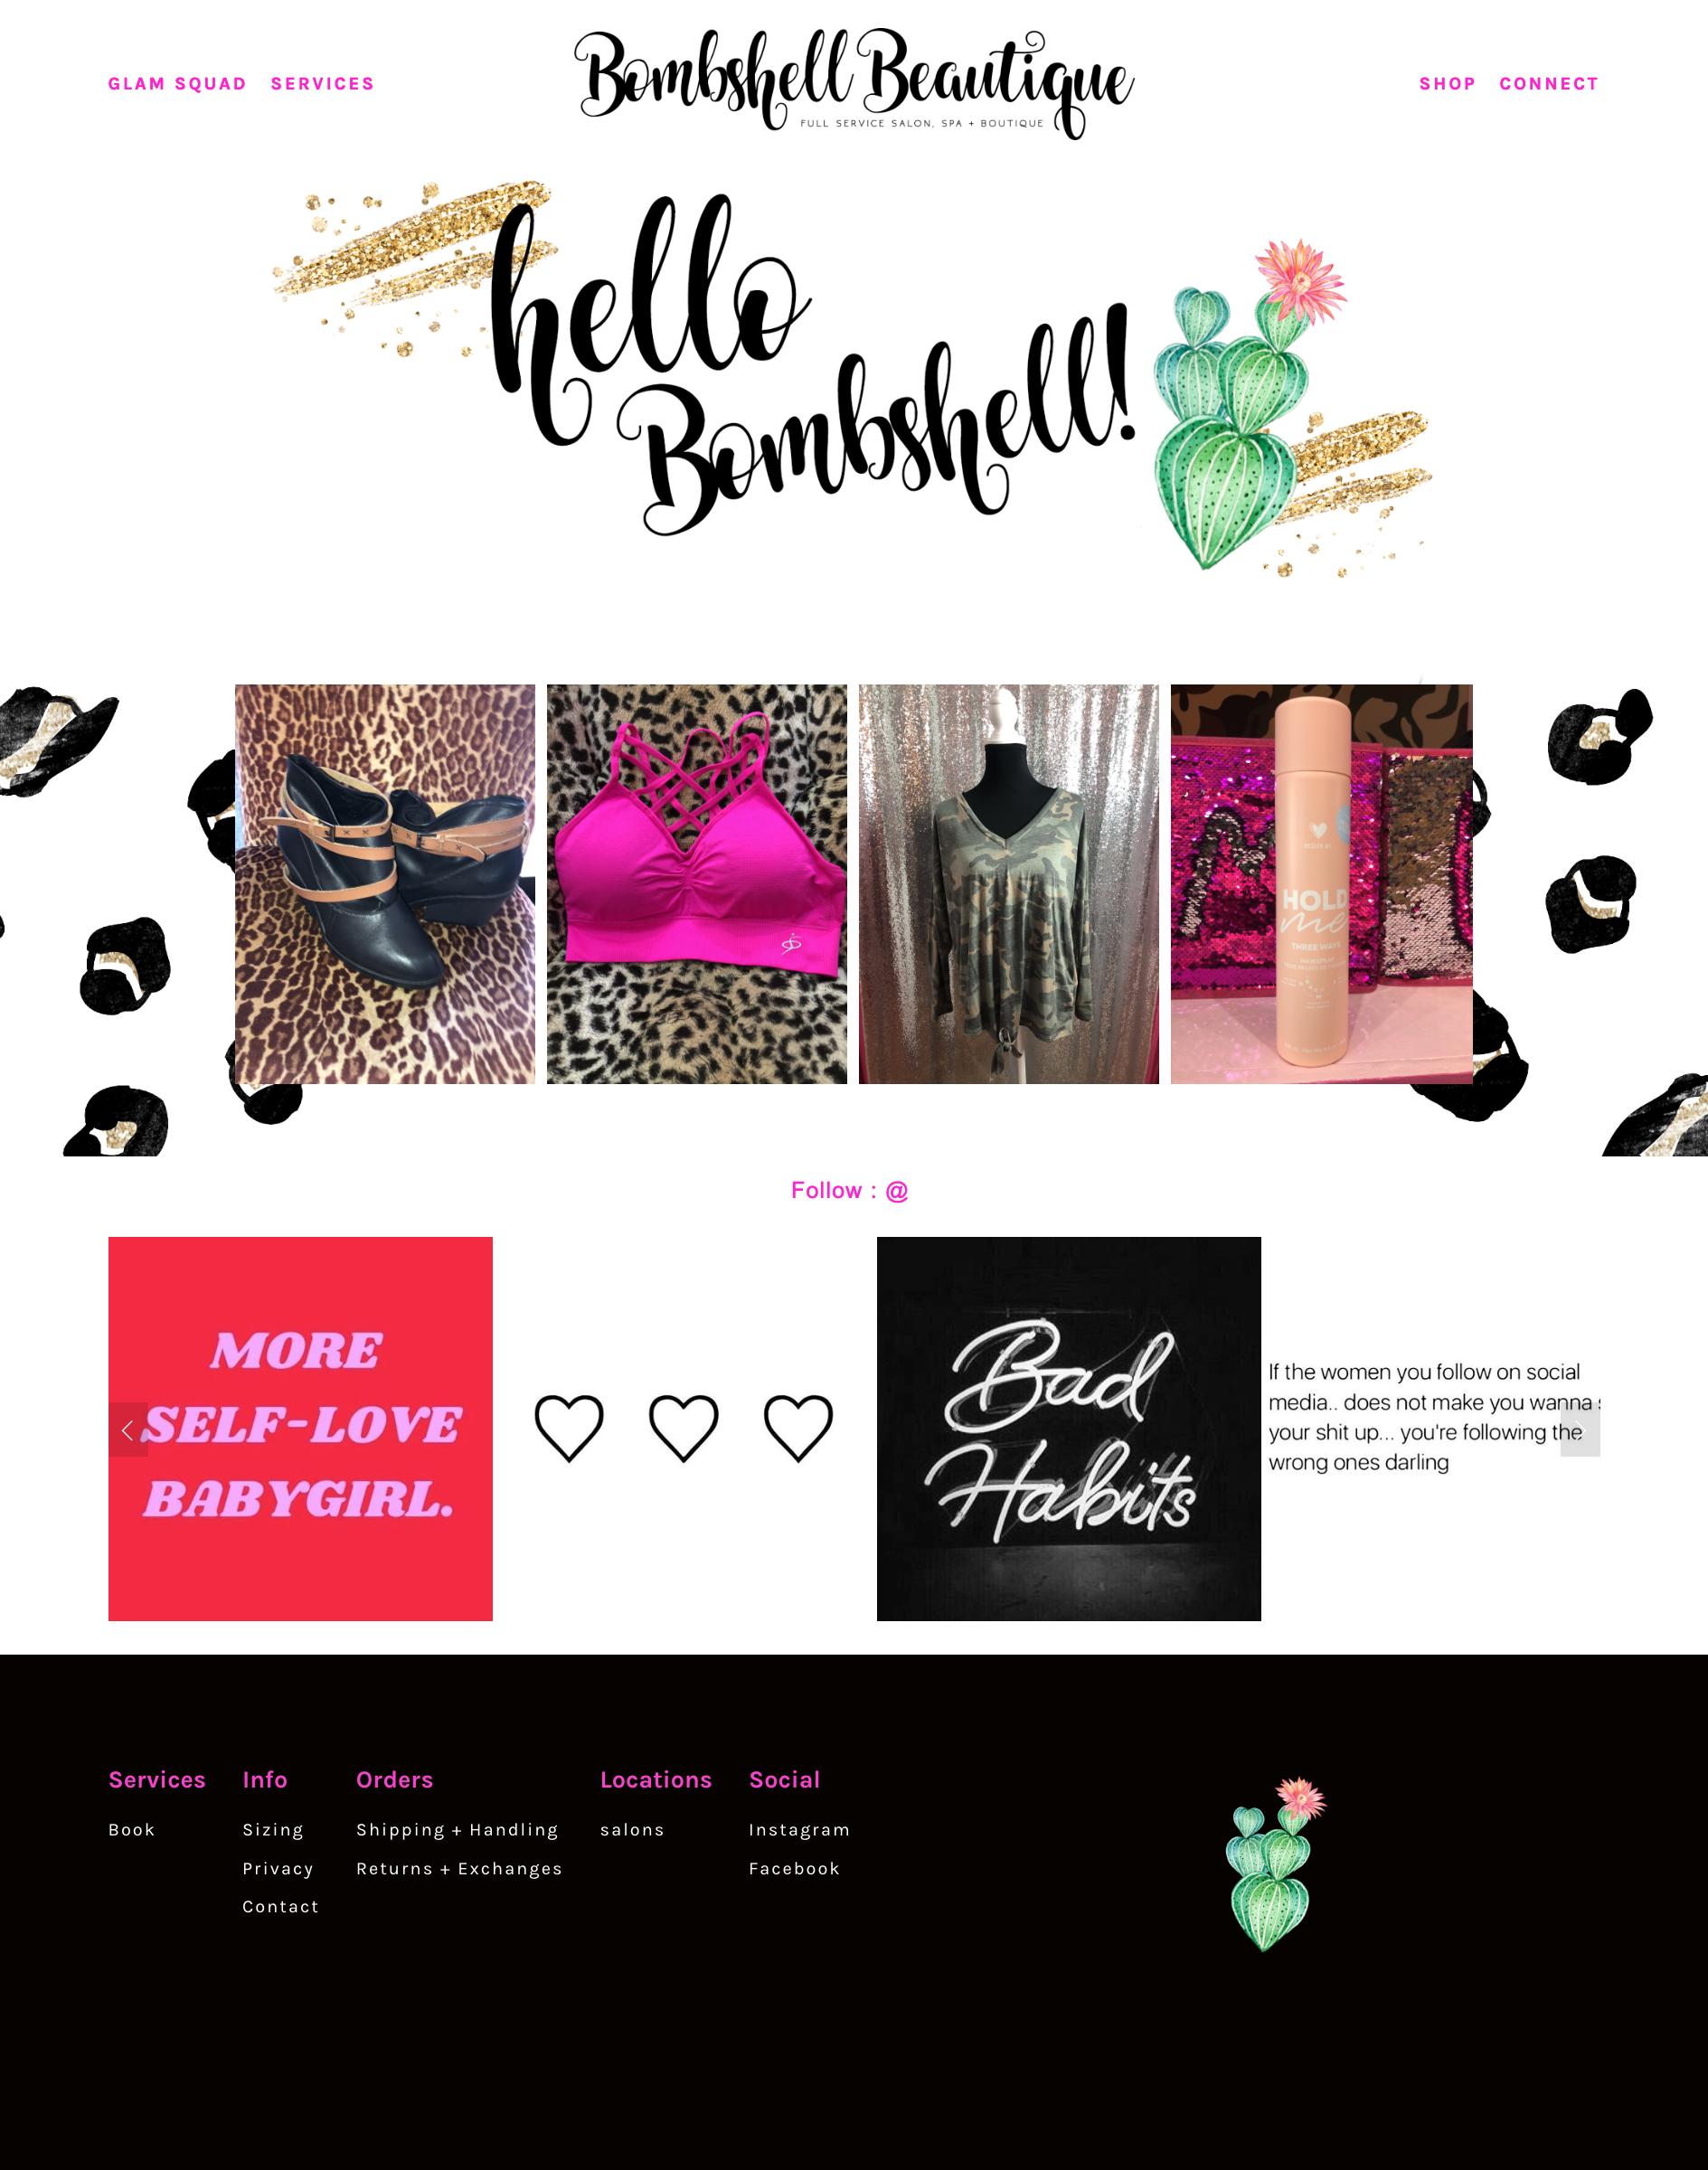 branding-website-designer-xxobri.com-bombshell-beautique.png